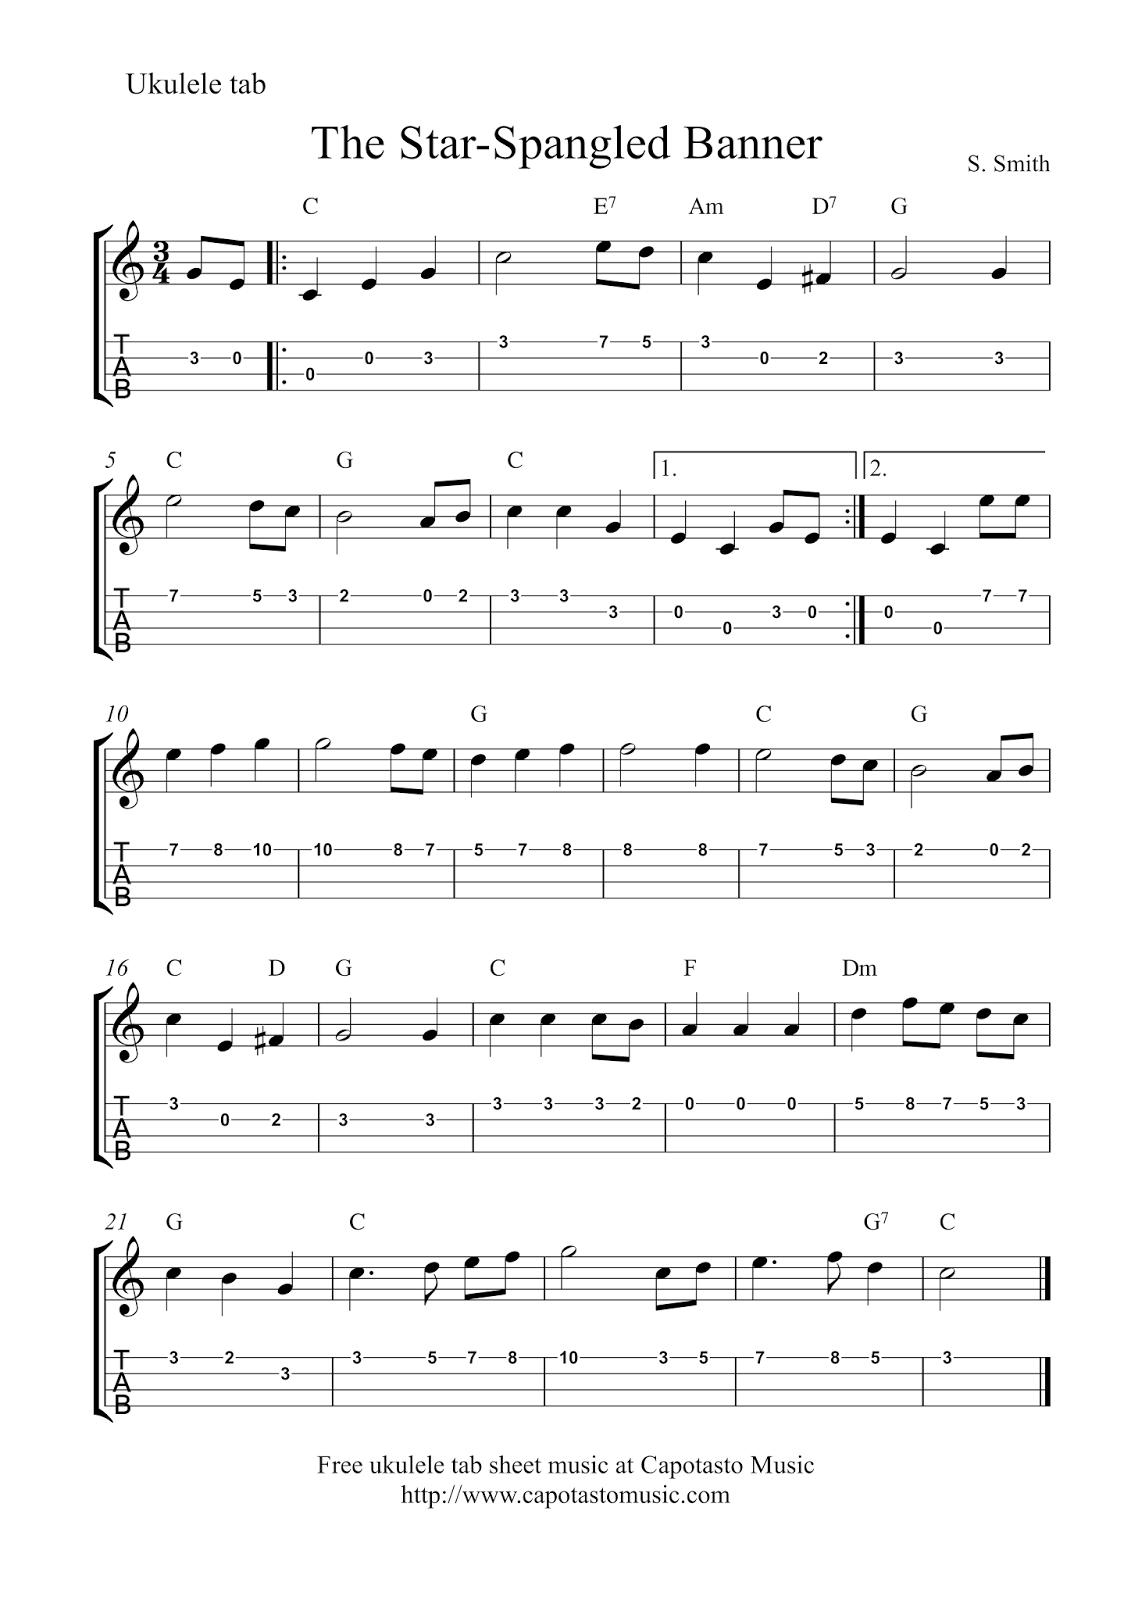 The Star Spangled Banner Free Ukulele Tablature Sheet Music Uke String Diagram Related Keywords Suggestions